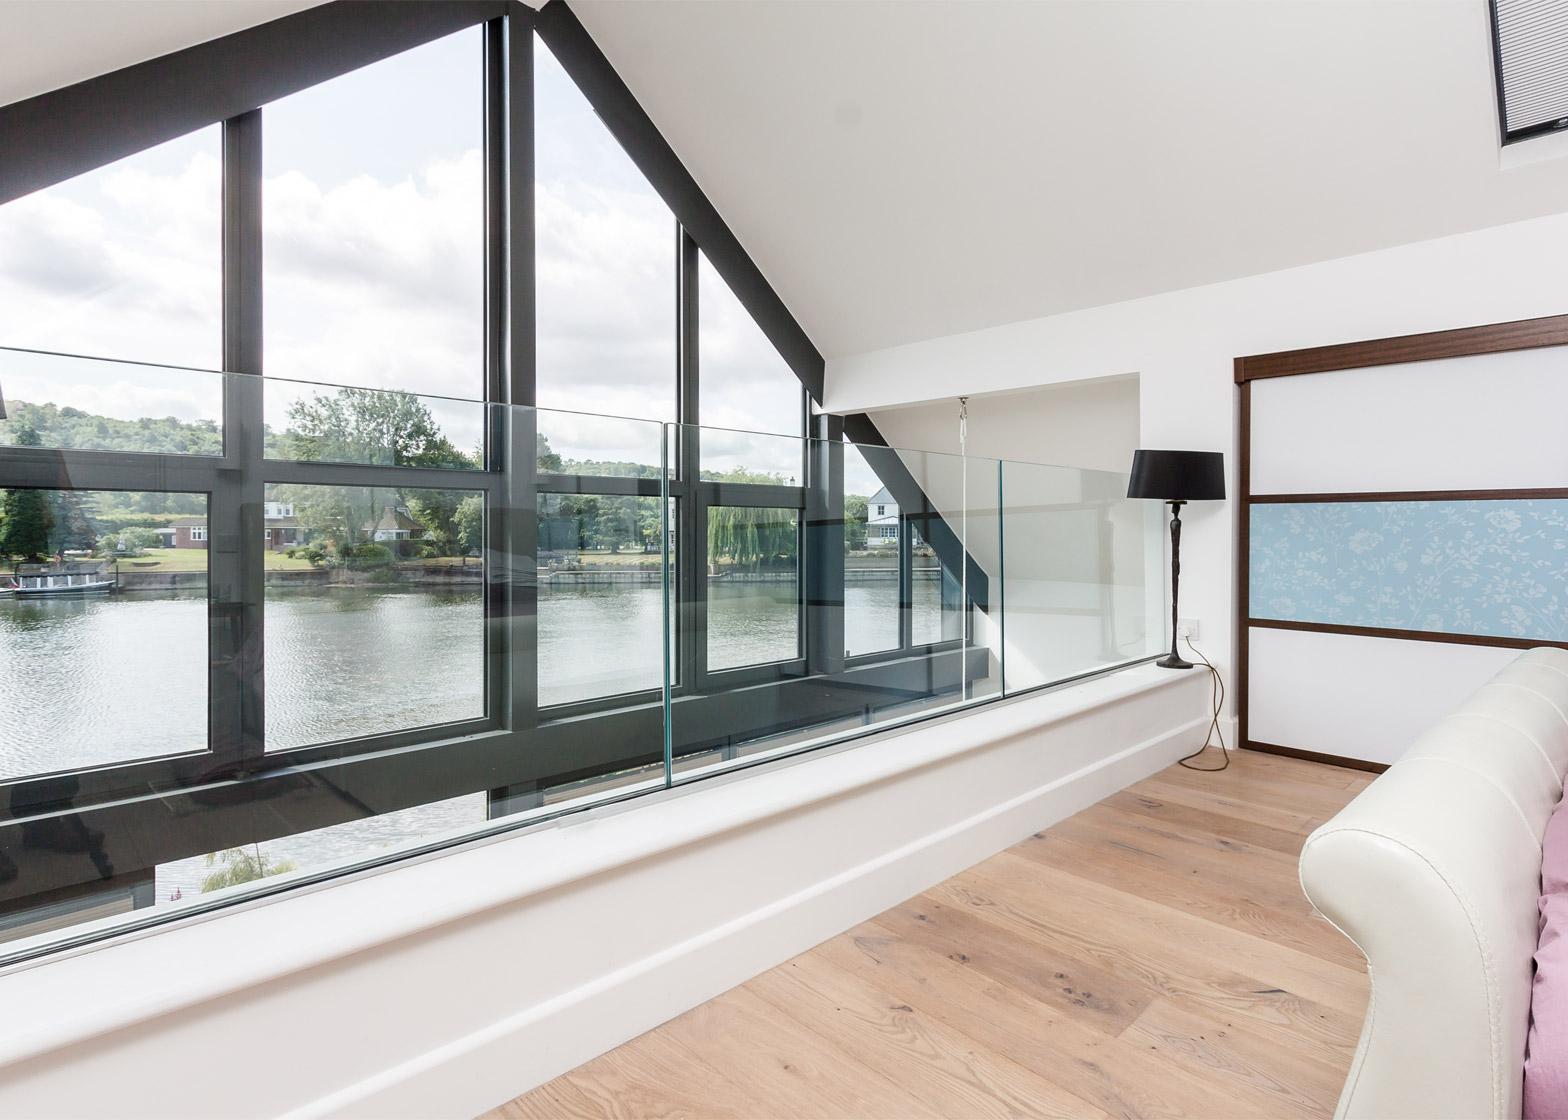 Amphibious House by Baca Architects